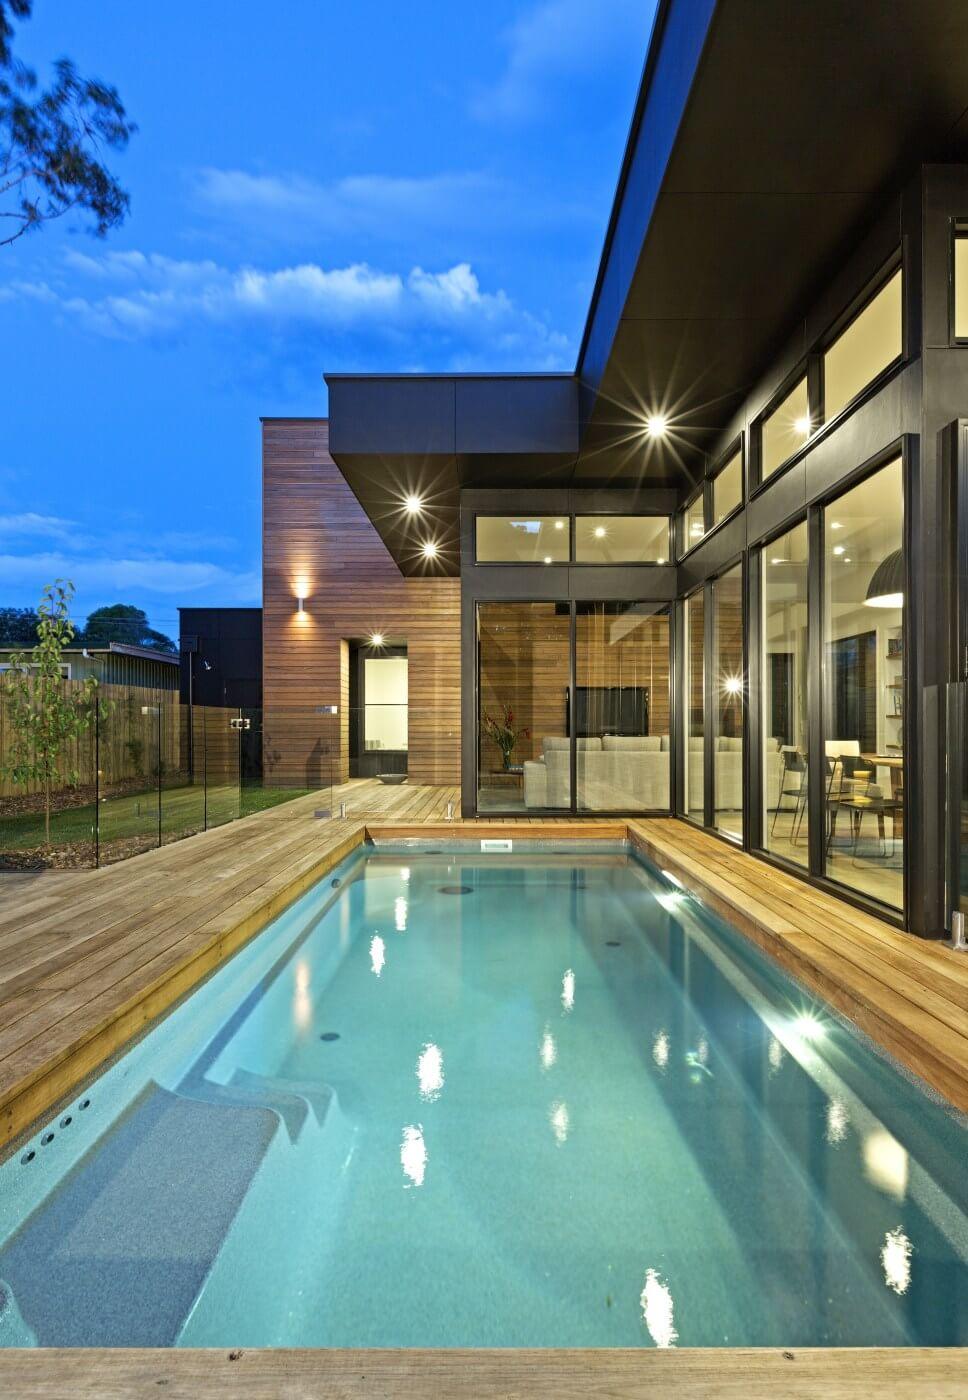 piscina de lux modele frumoase 55